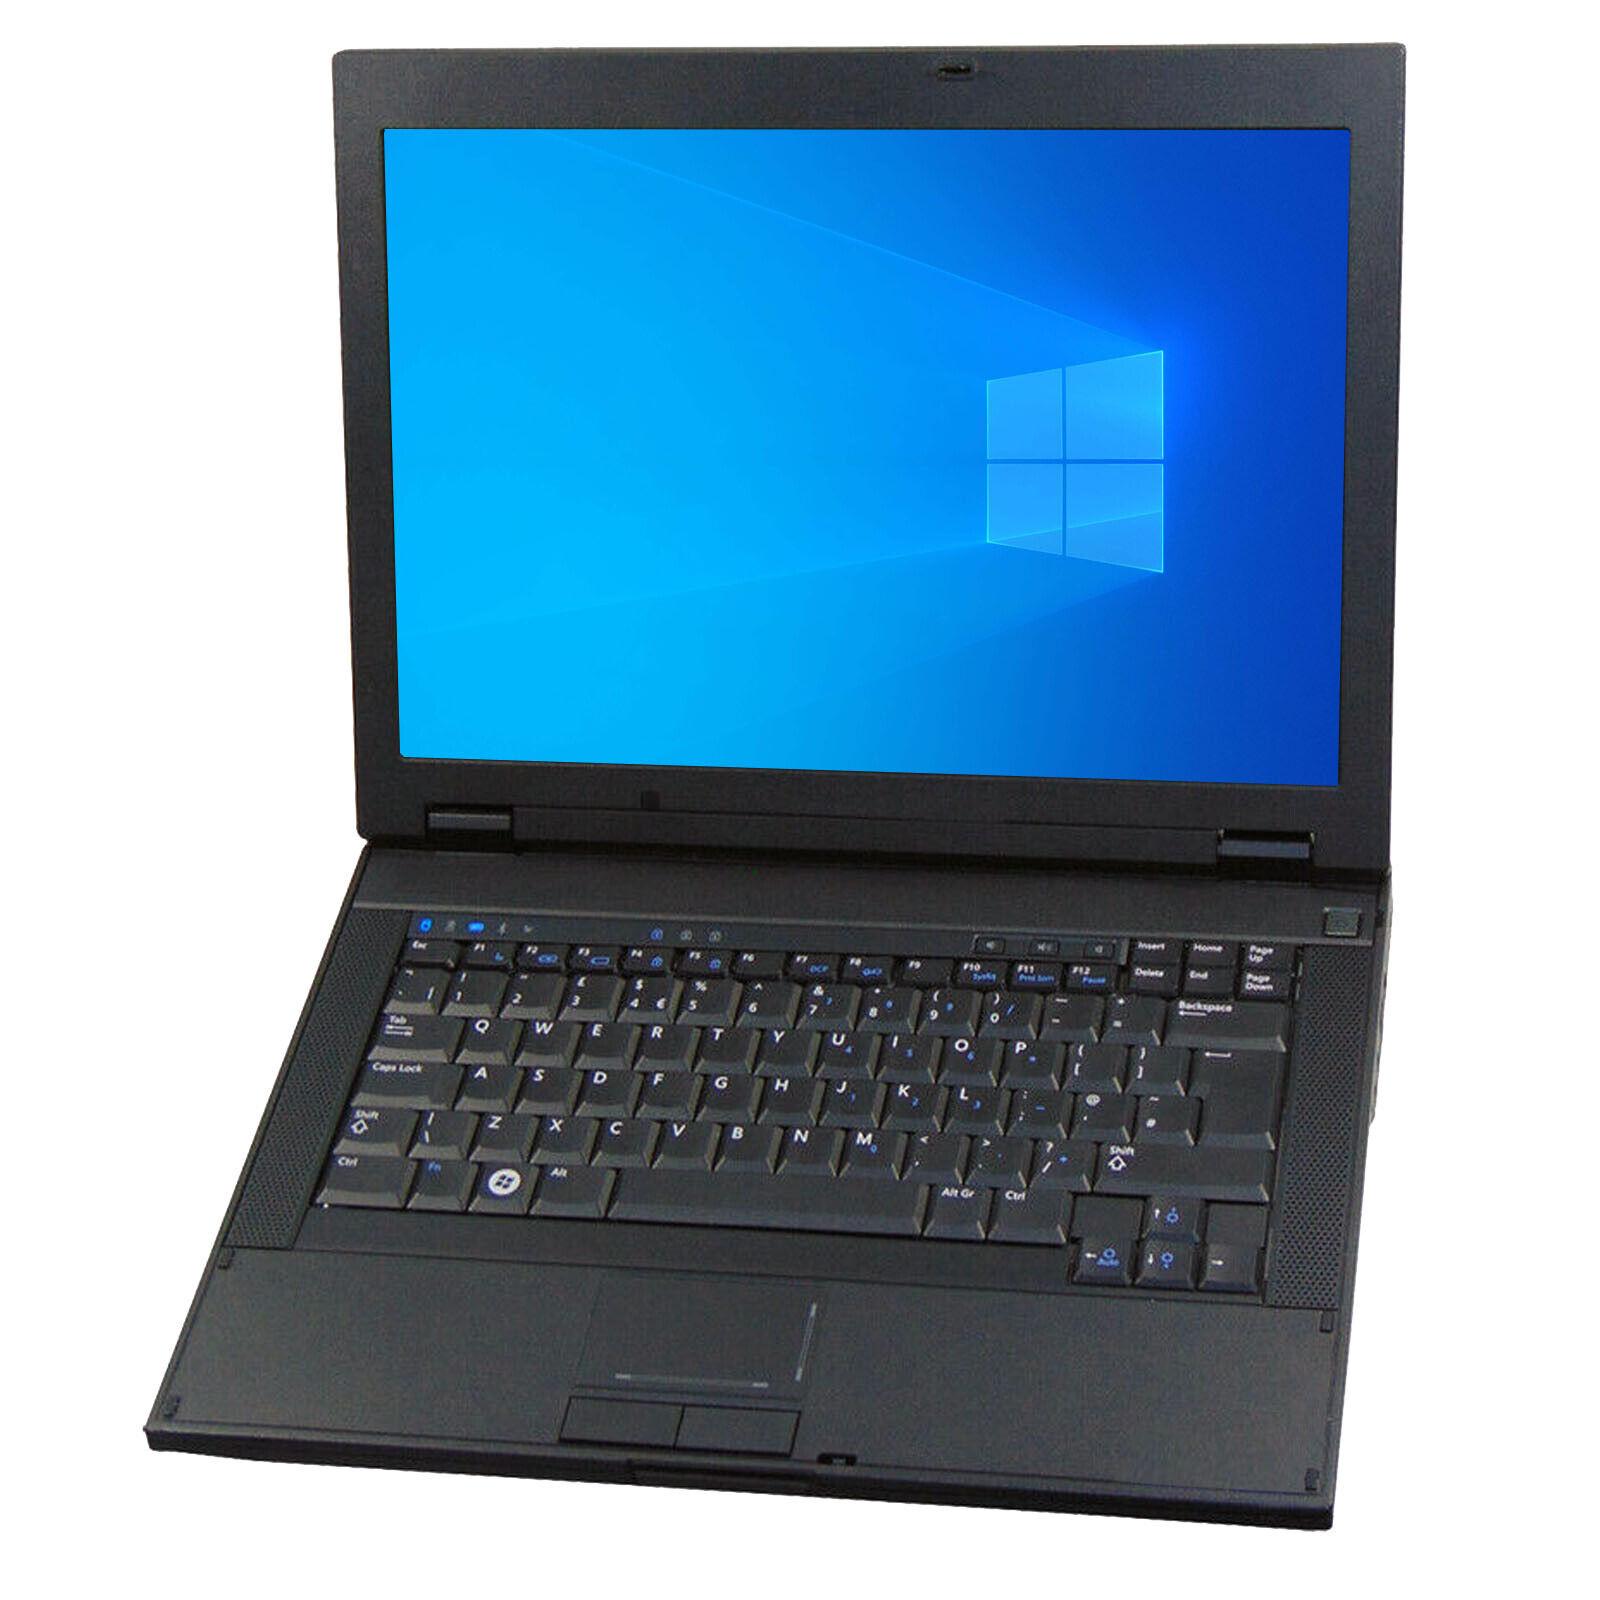 Laptop Windows - CHEAP FAST WINDOWS 10 LAPTOP NETBOOK NOTEBOOK WIRELESS Wi-Fi 4GB RAM 320GB HDD